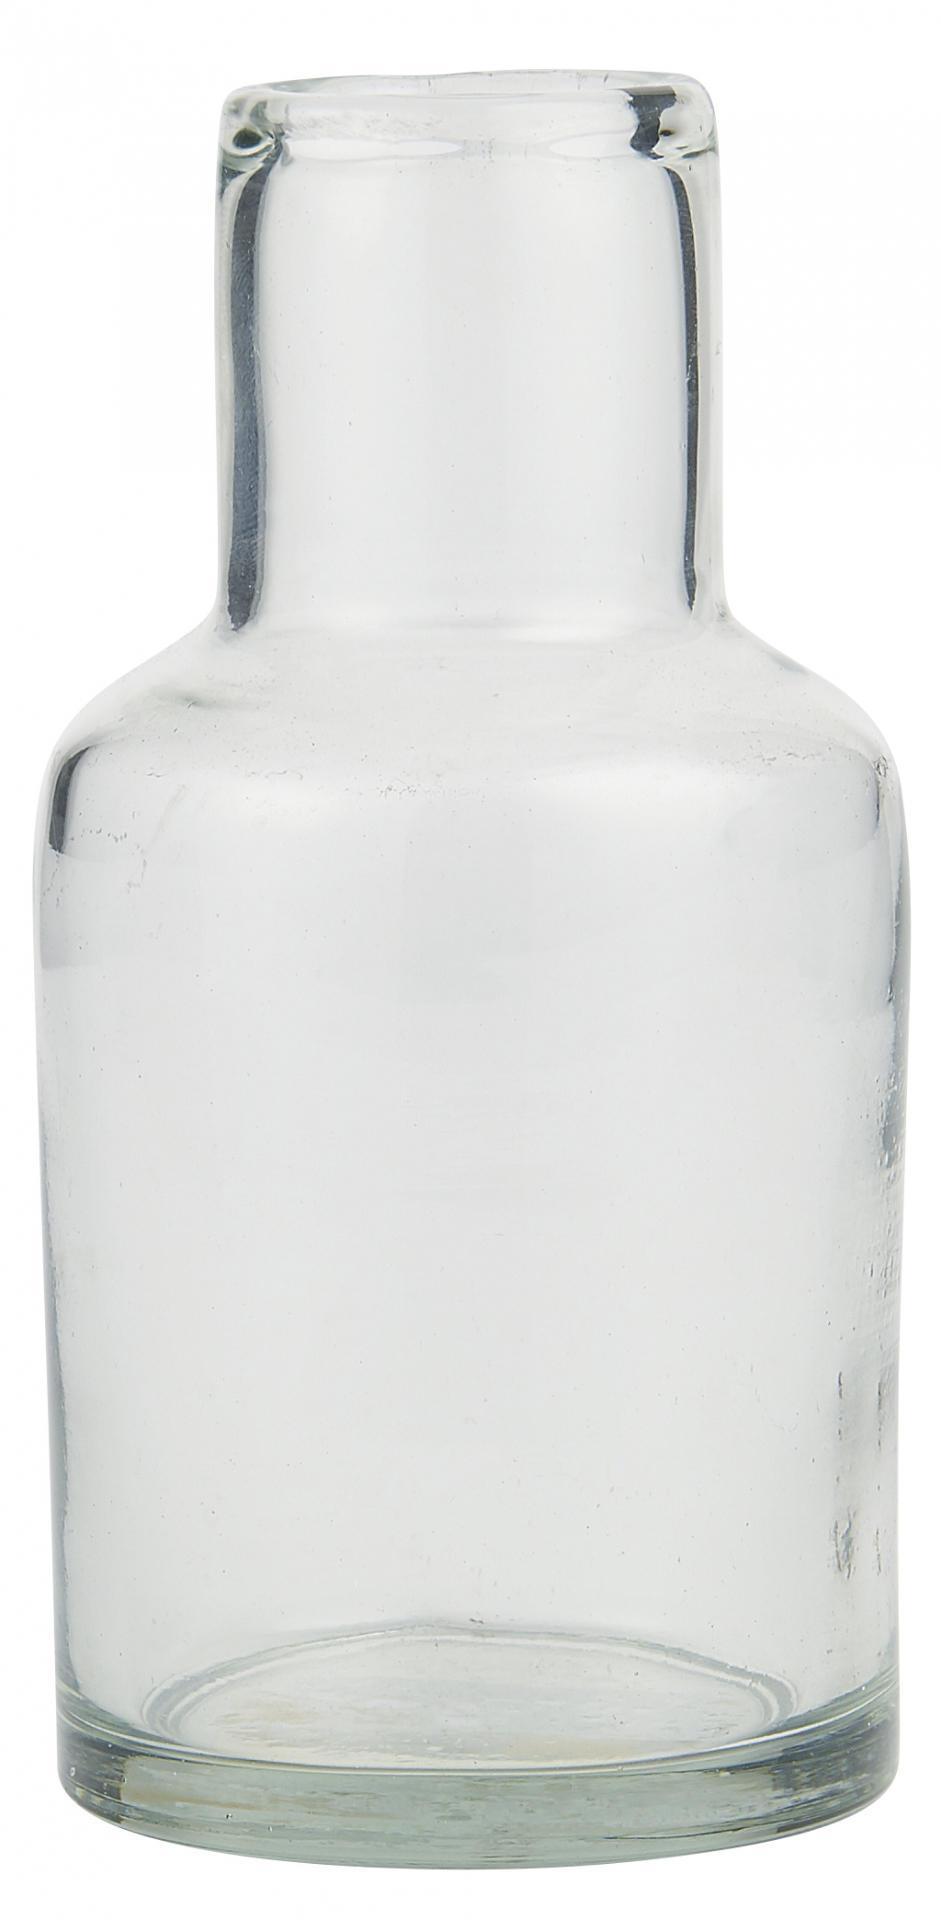 IB LAURSEN Skleněná váza Long Neck Handblown, čirá barva, sklo